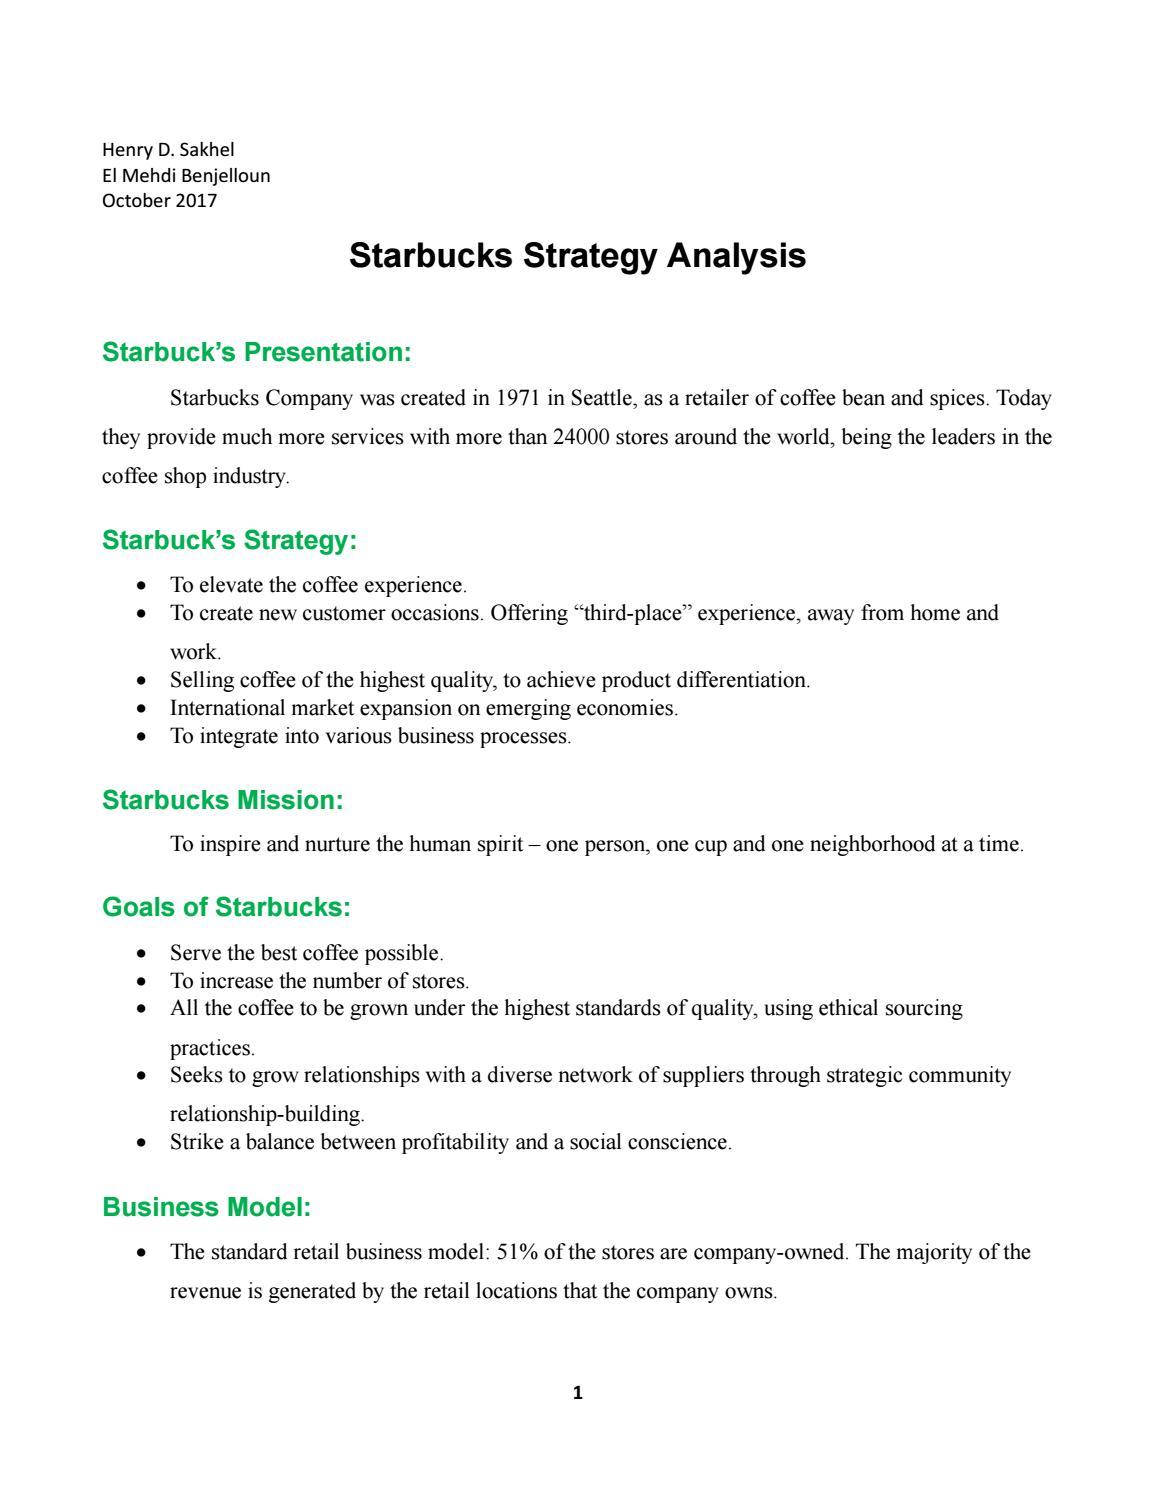 starbucks differentiation strategy